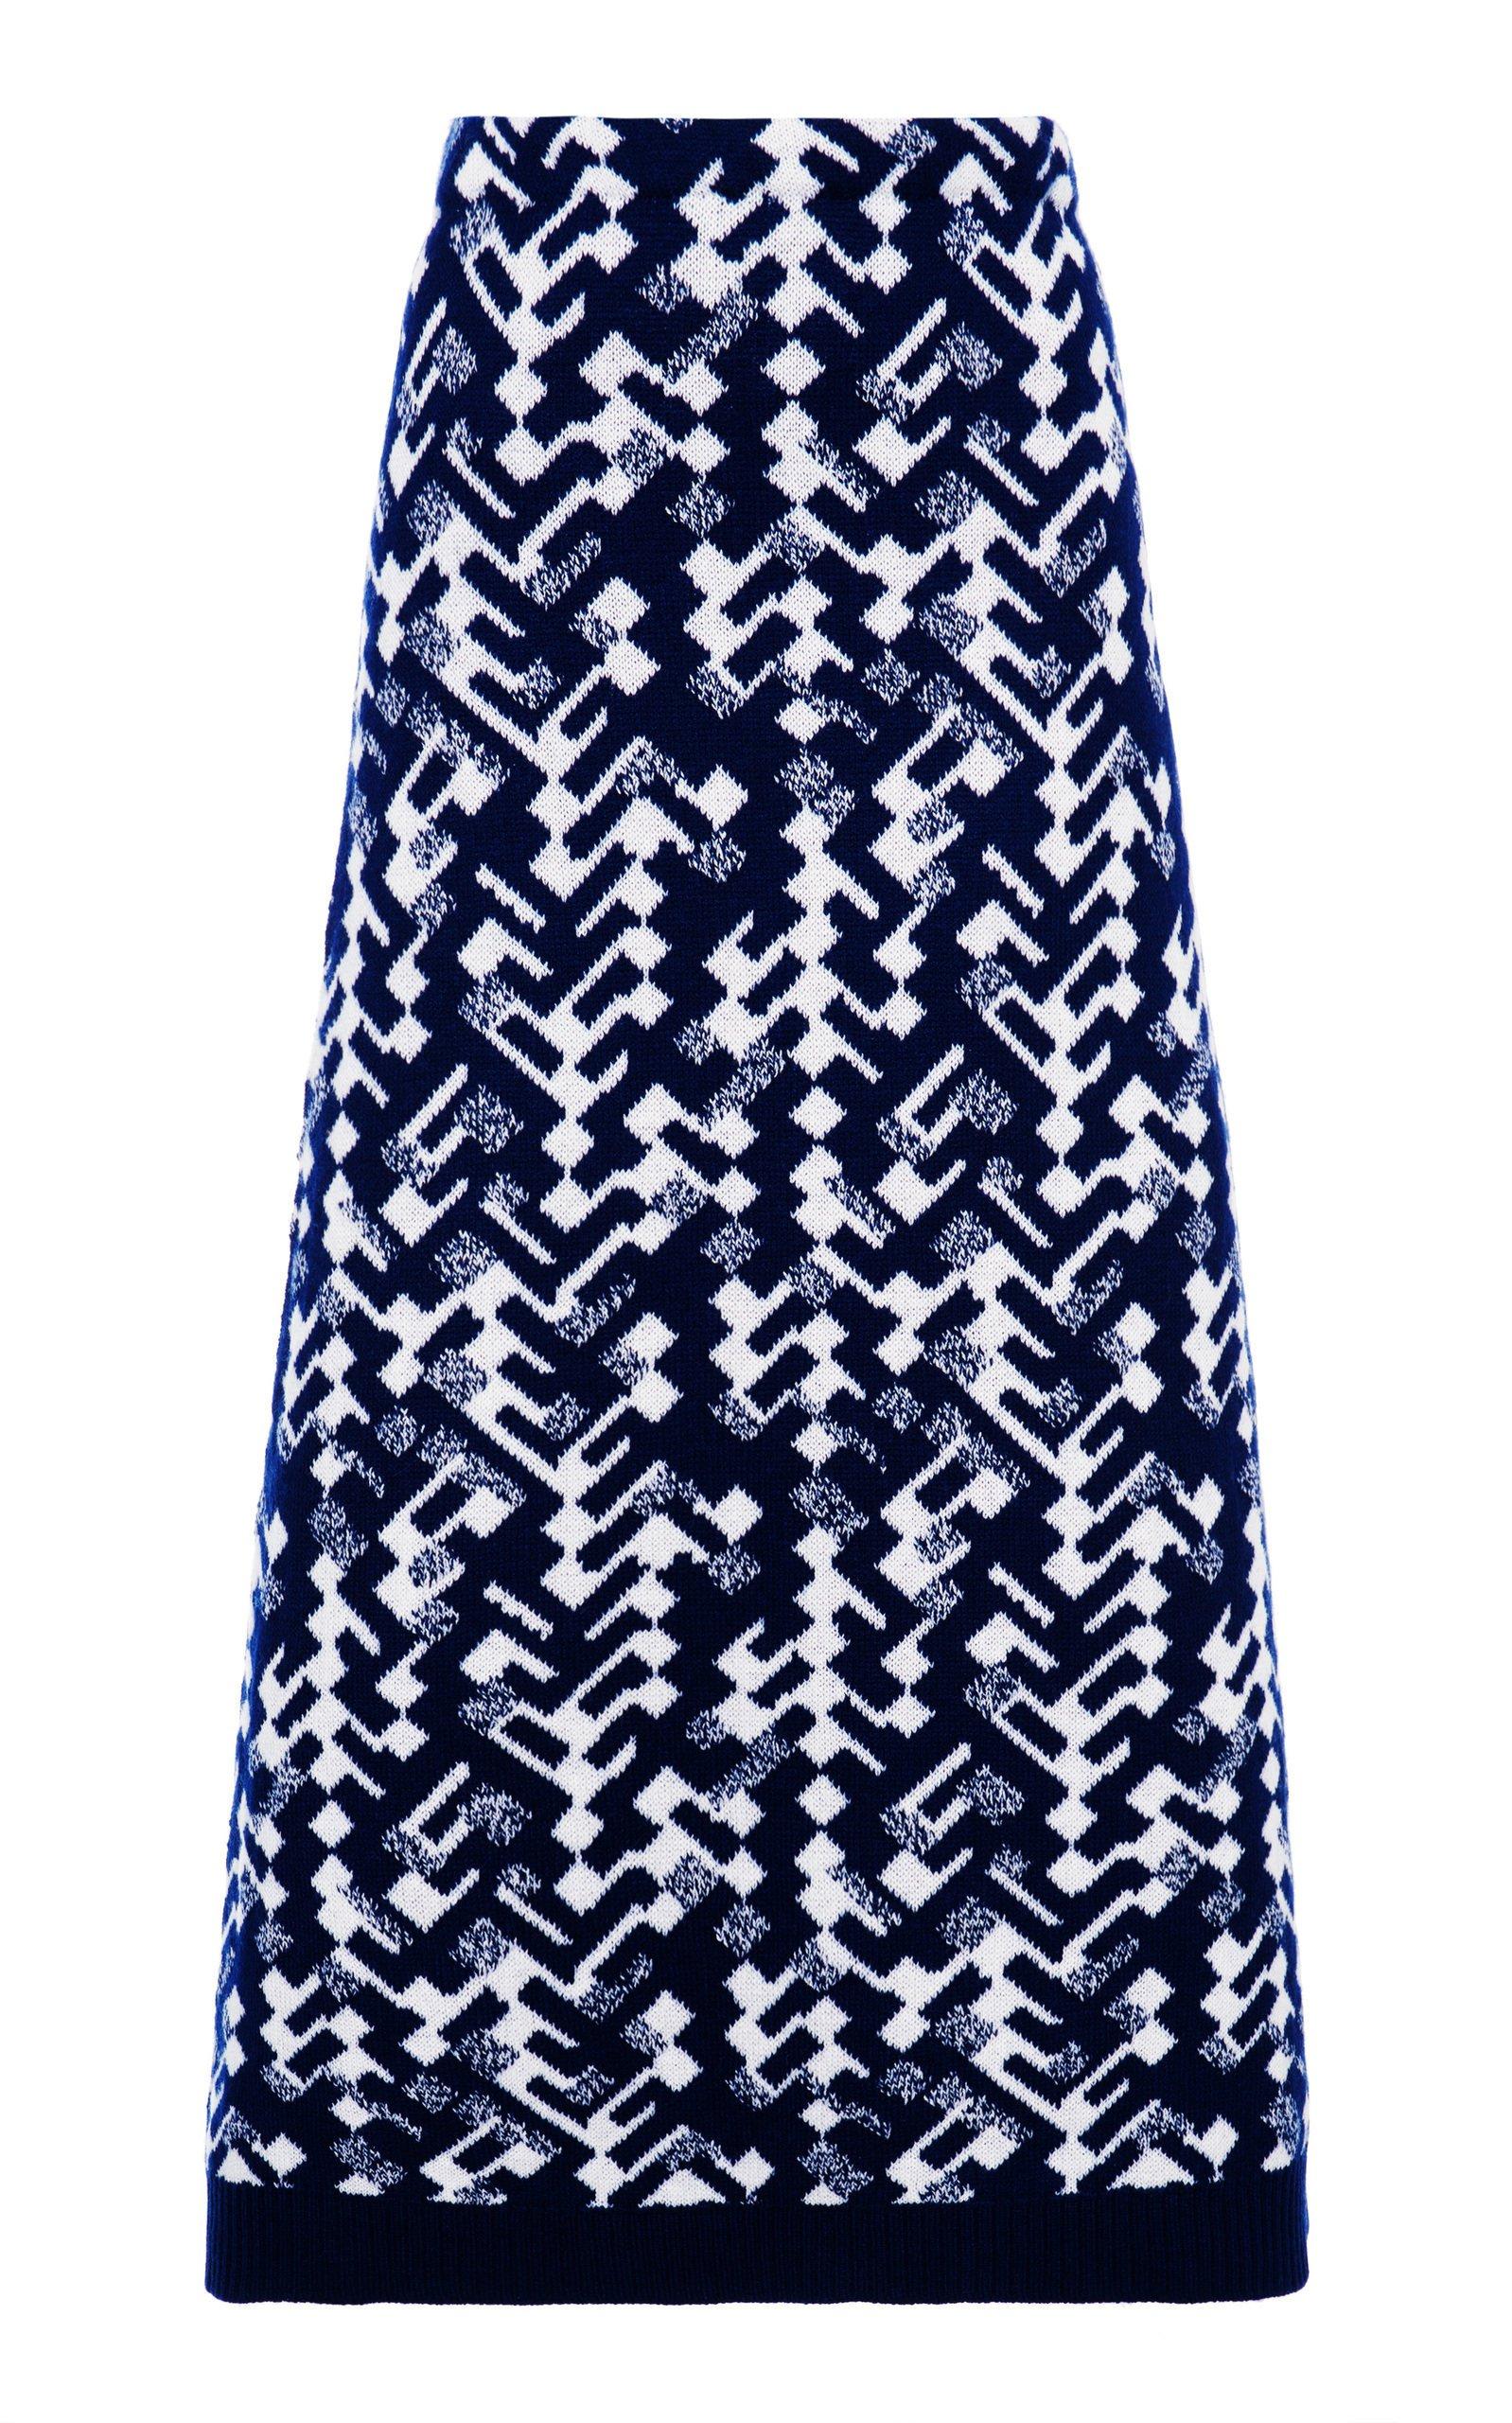 Prada Printed Cashmere Midi Skirt Size: 44